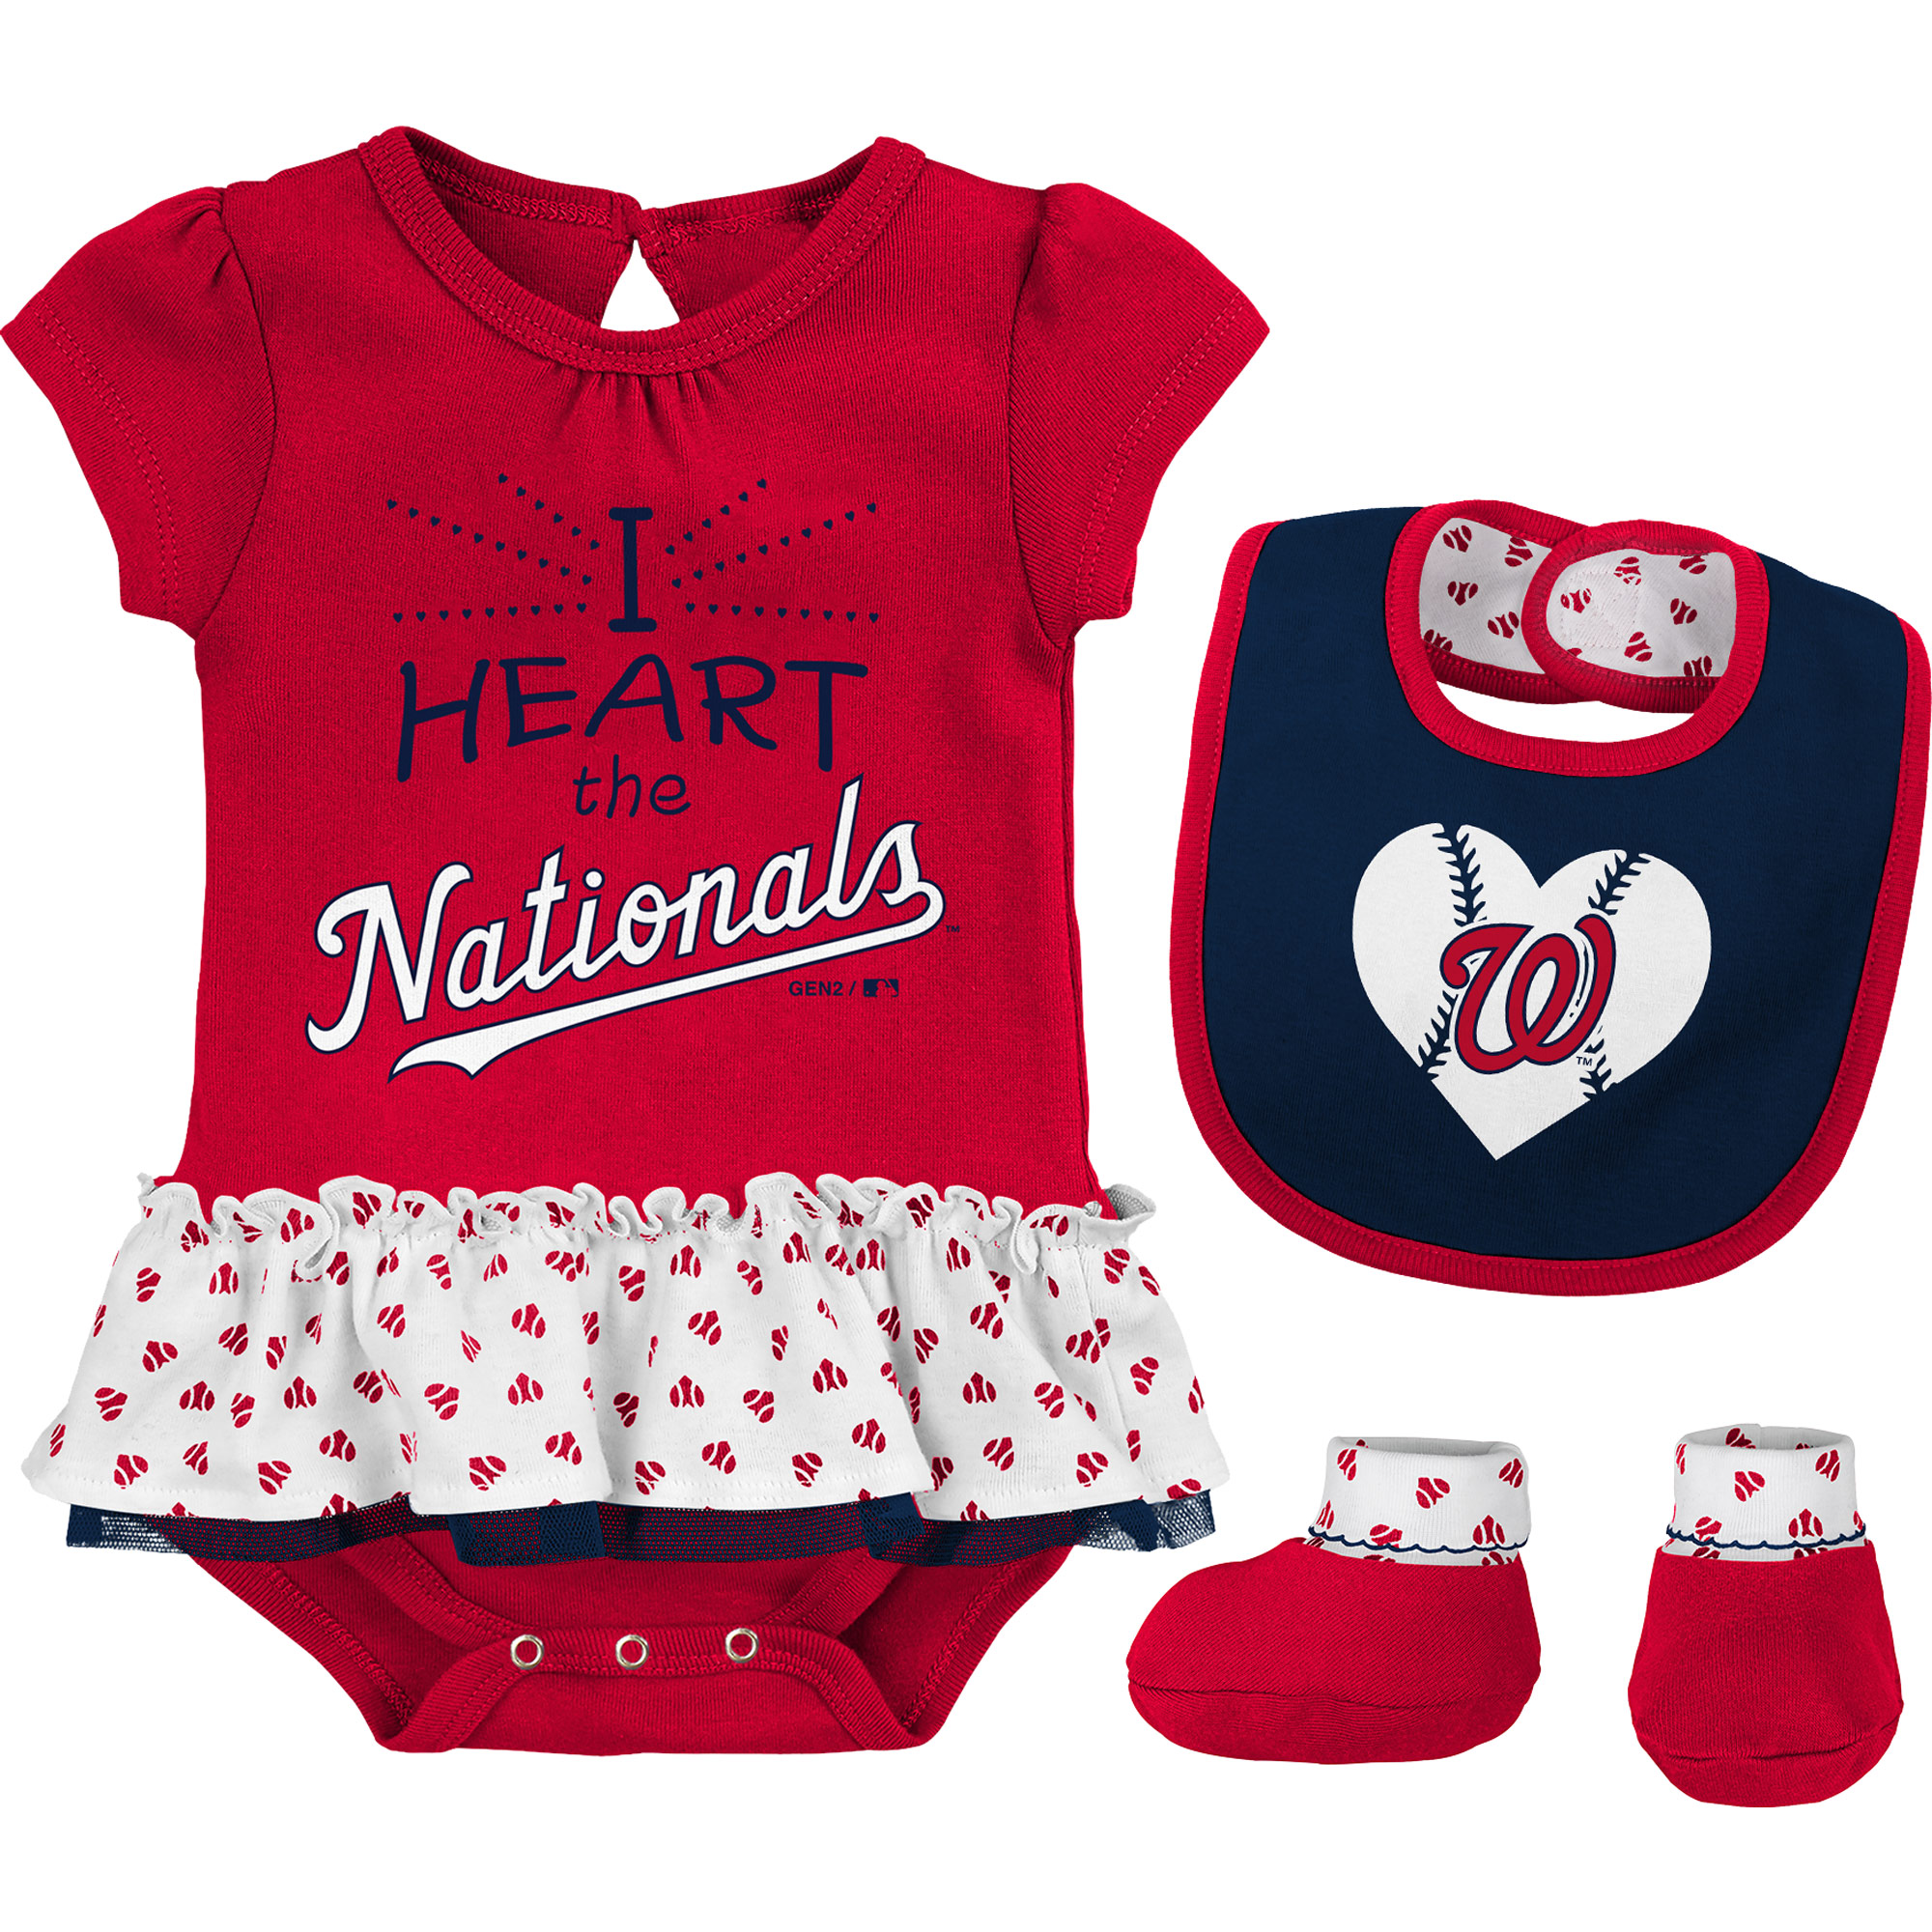 Washington Nationals Girls Infant Bodysuit, Bib And Booty Set - Red/Navy